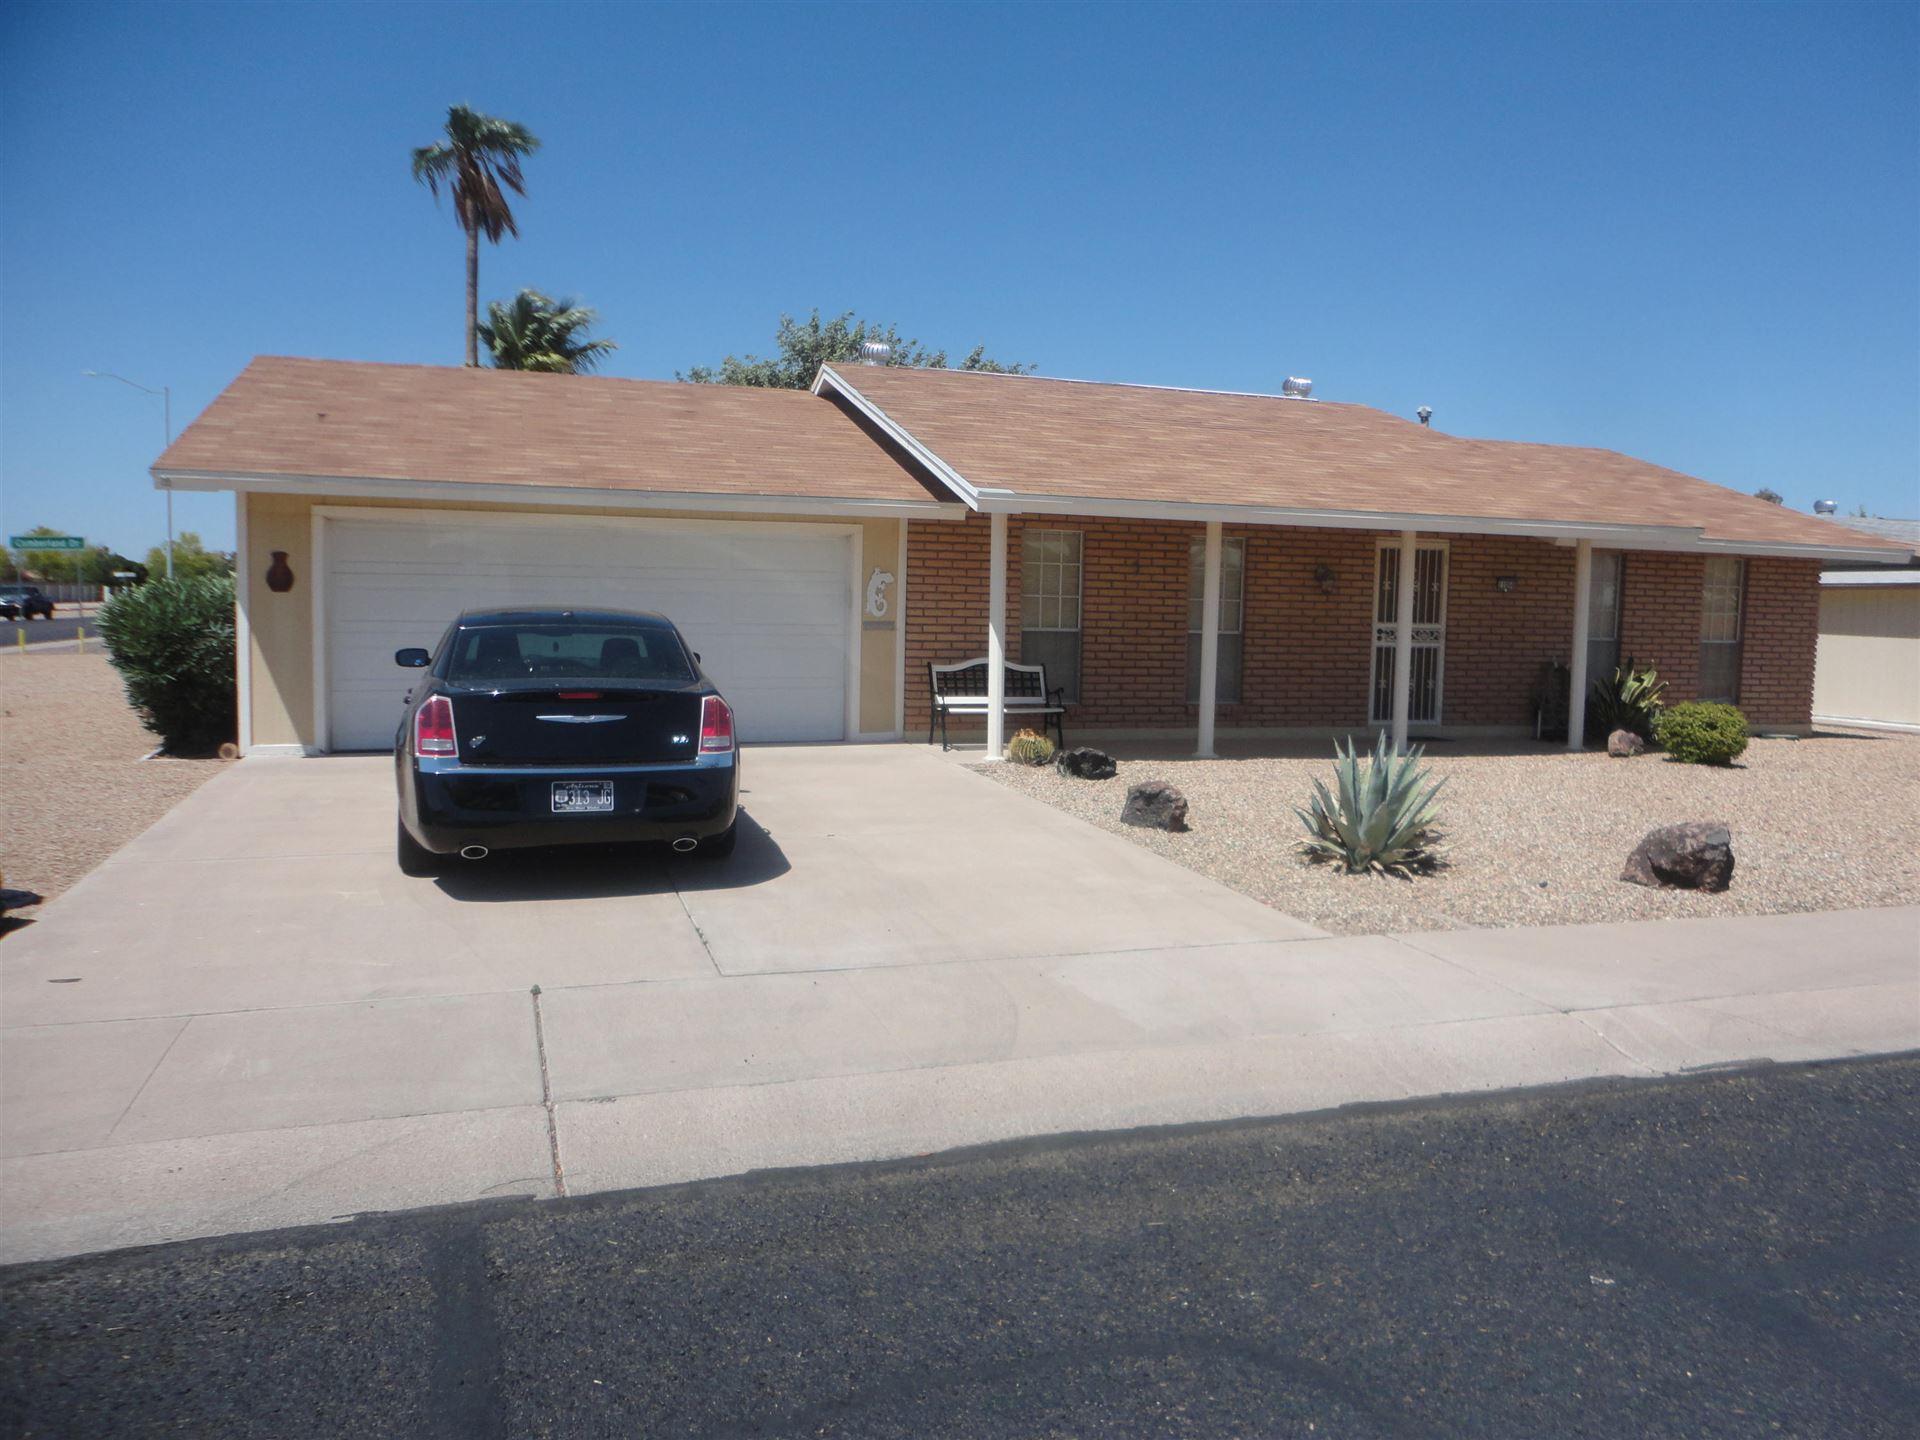 Photo of 11050 W Cheryl Drive, Sun City, AZ 85351 (MLS # 6230282)